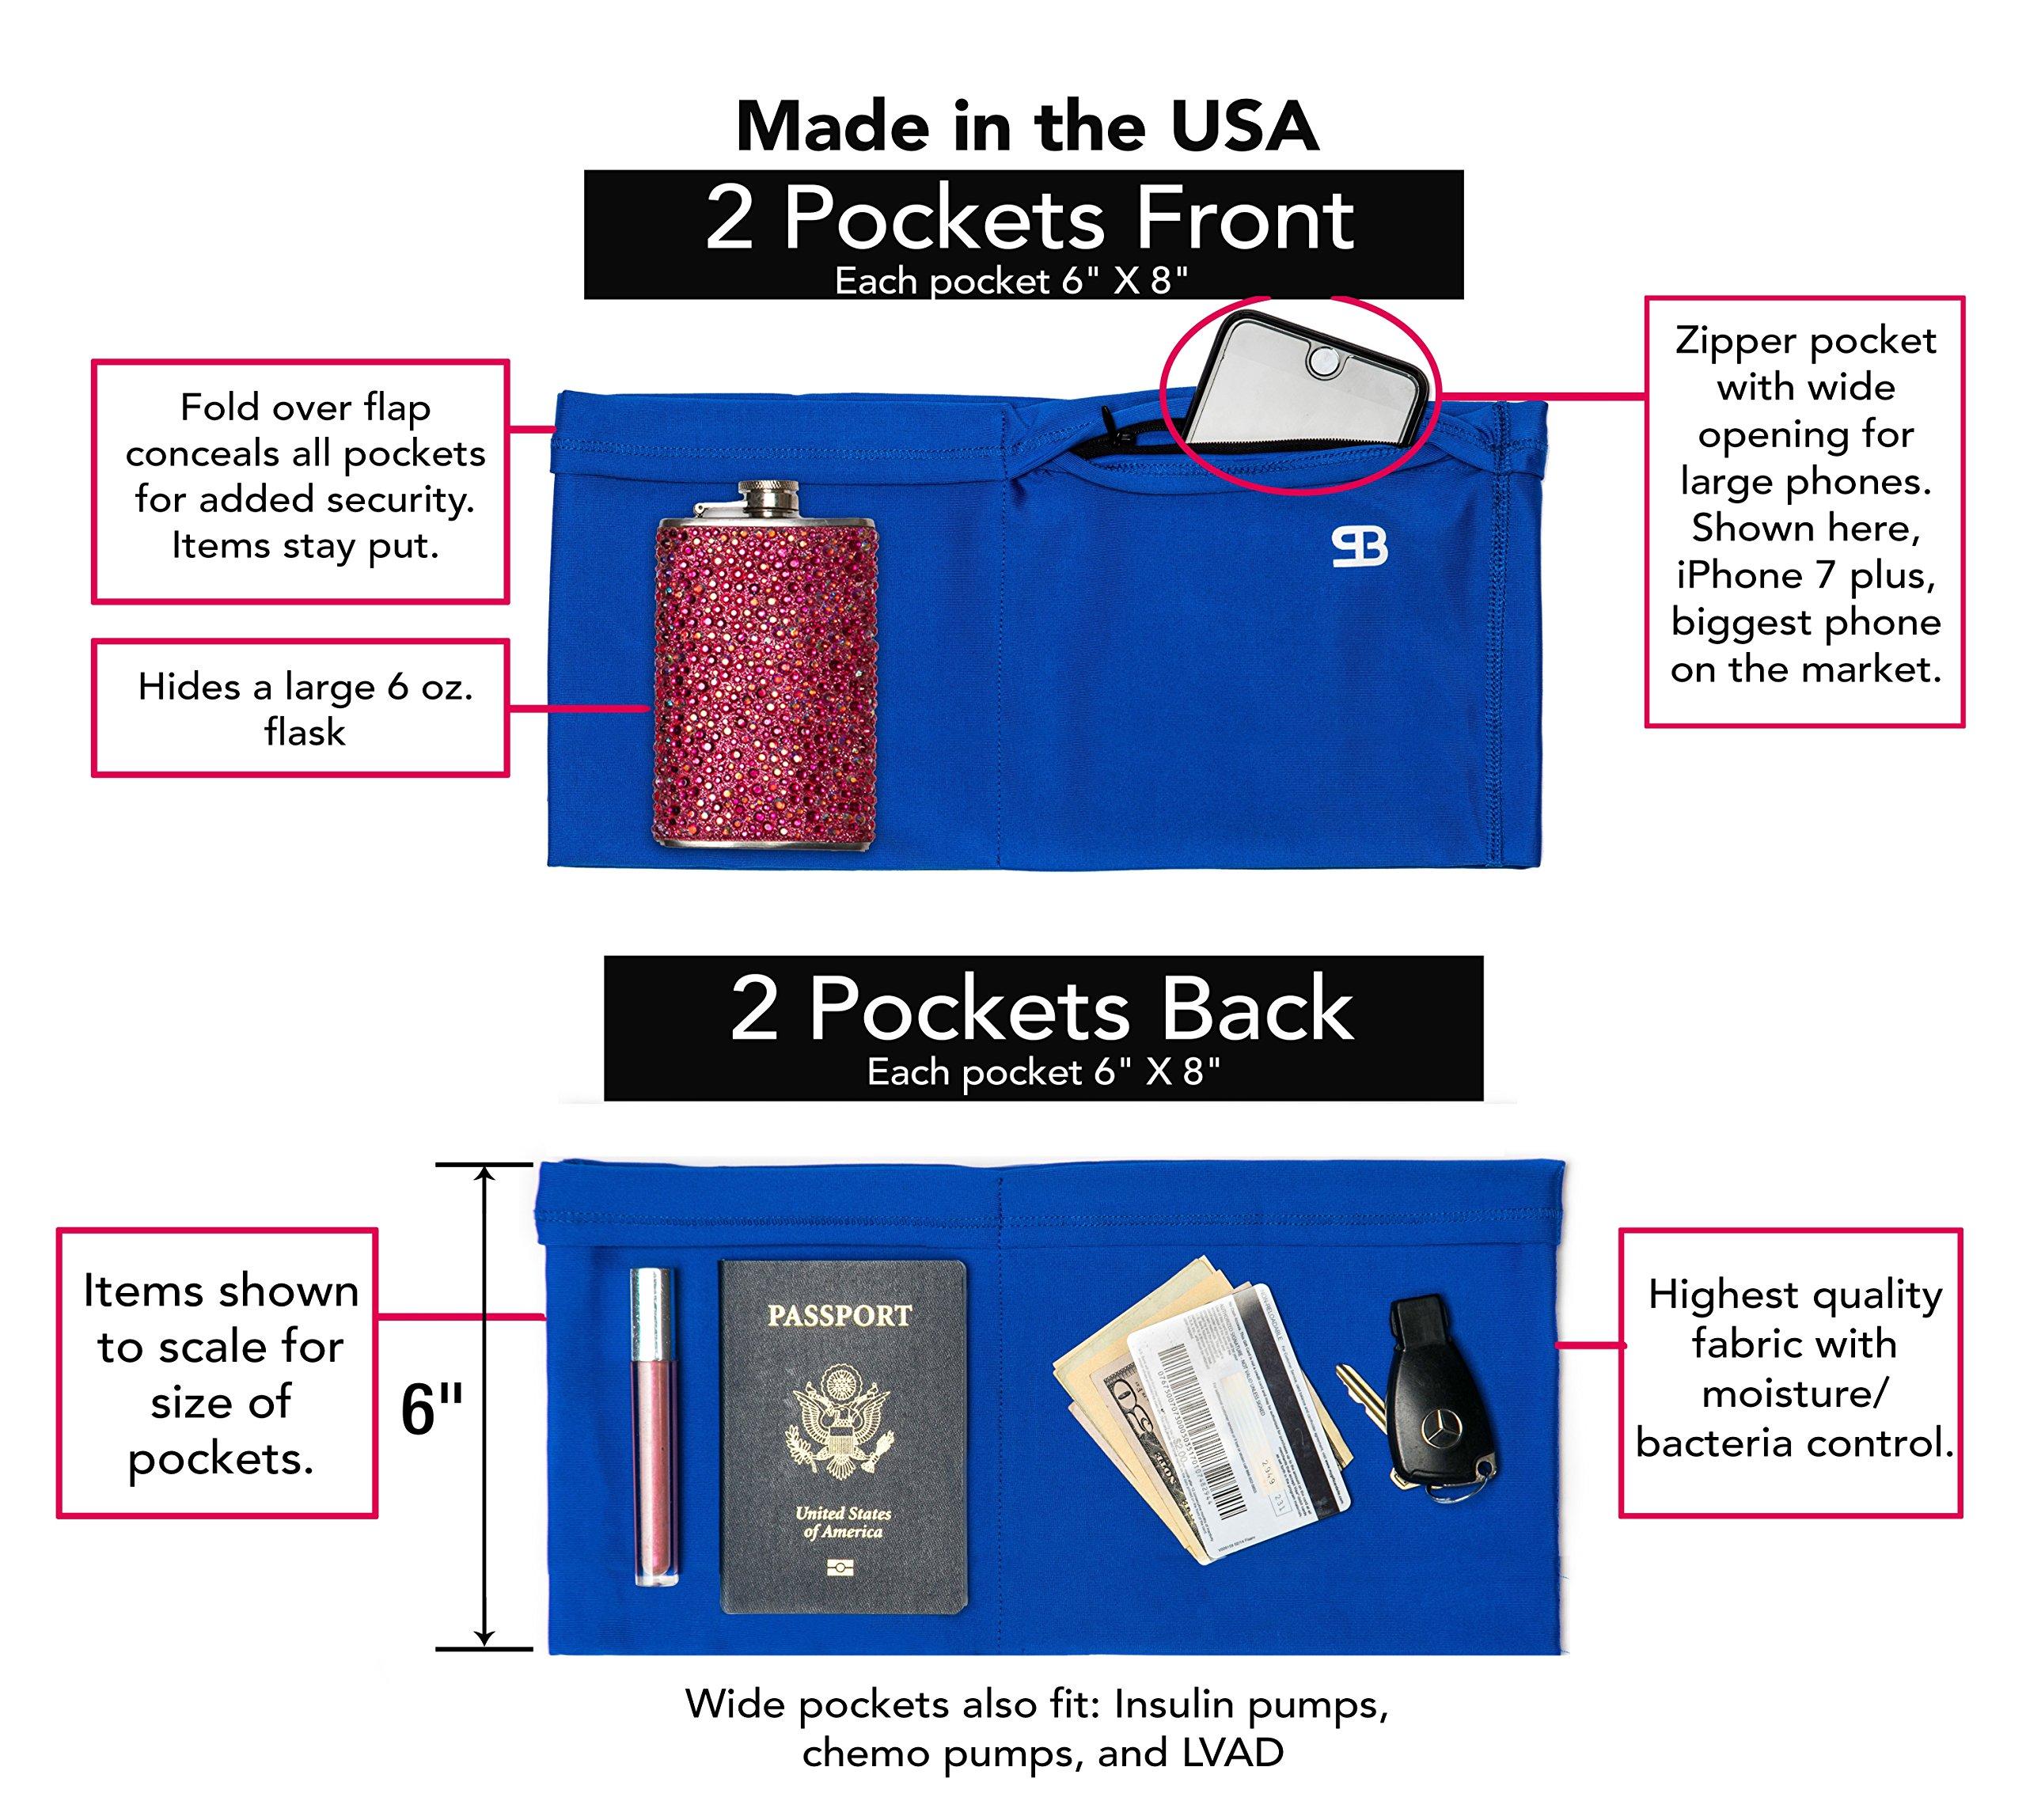 Stashbandz Unisex Money Travel Belt, Running Belt, Fanny and Waist Pack, 4 Large Security Pockets and Zipper, Fits Phones Passport and More, Extra Wide Spandex by Stashbandz (Image #3)